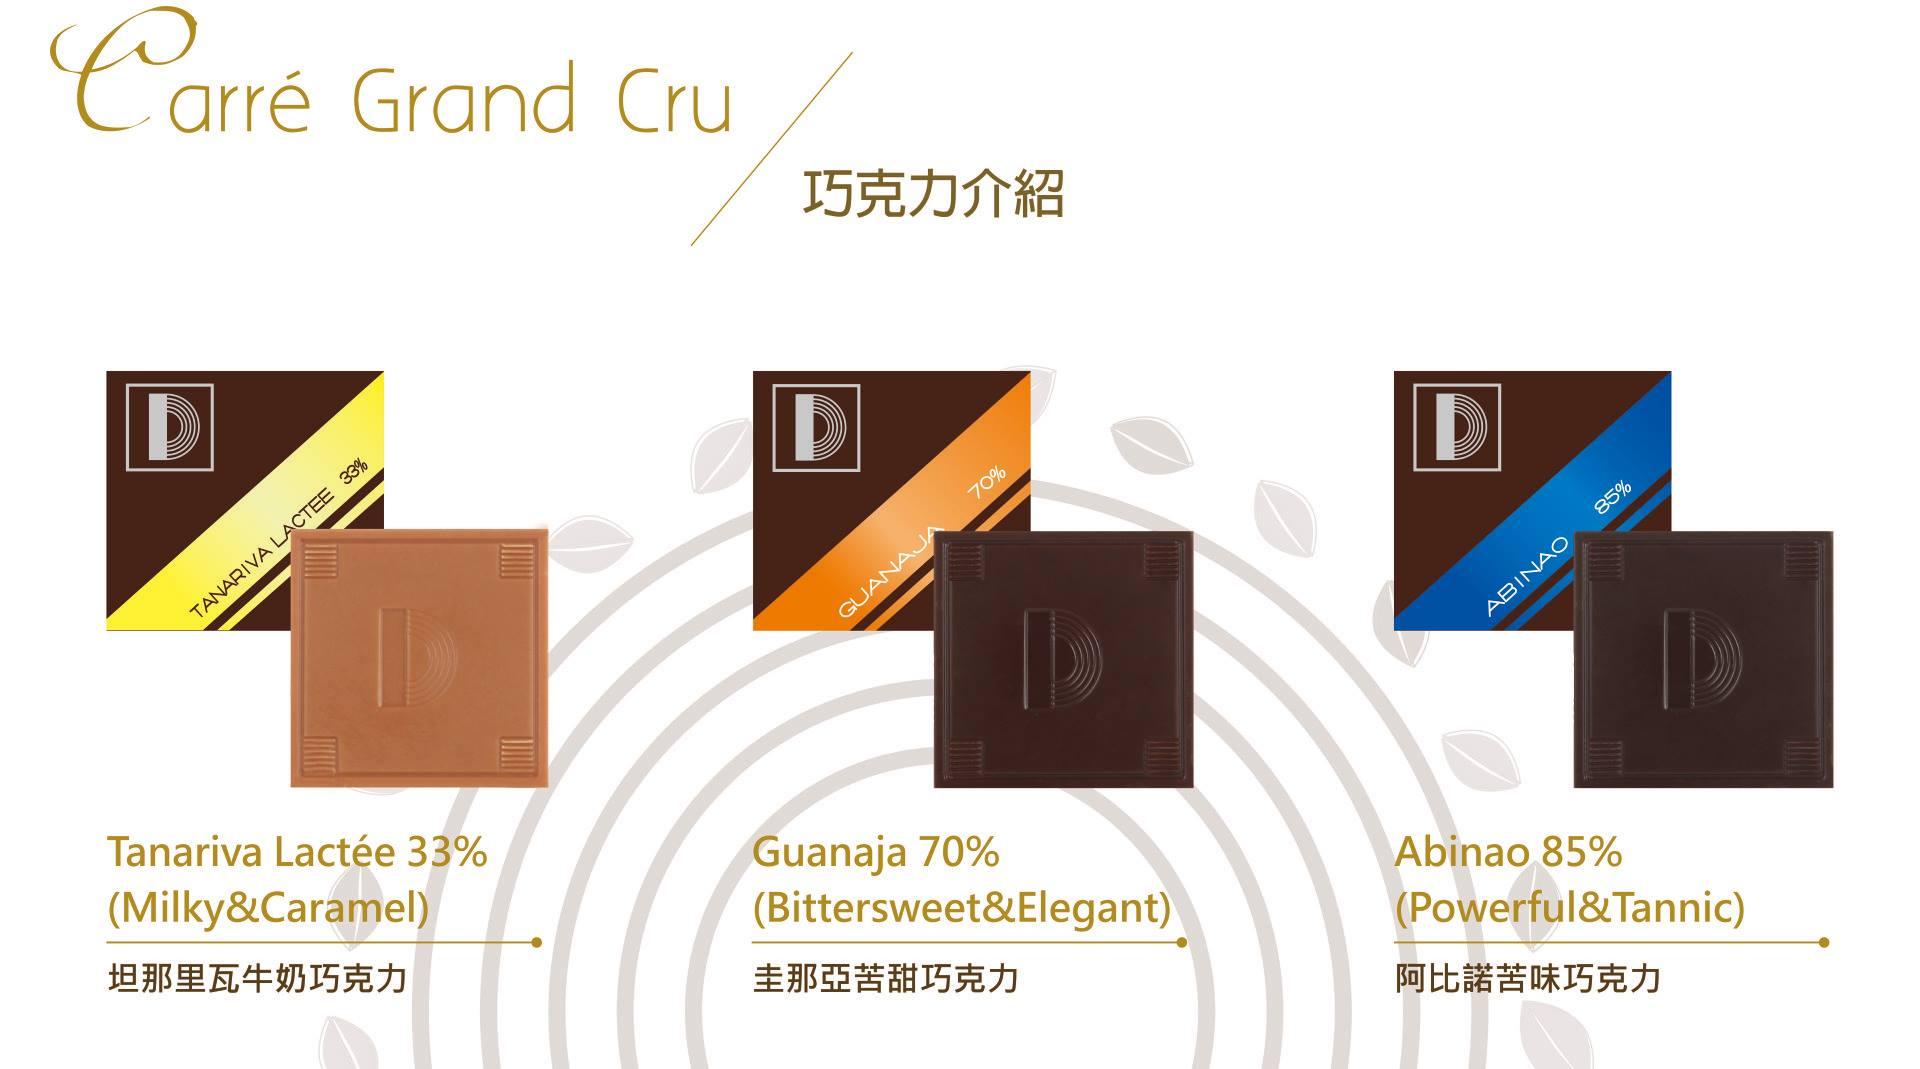 Carre Grand Cru 極品片狀巧克力 9片 3